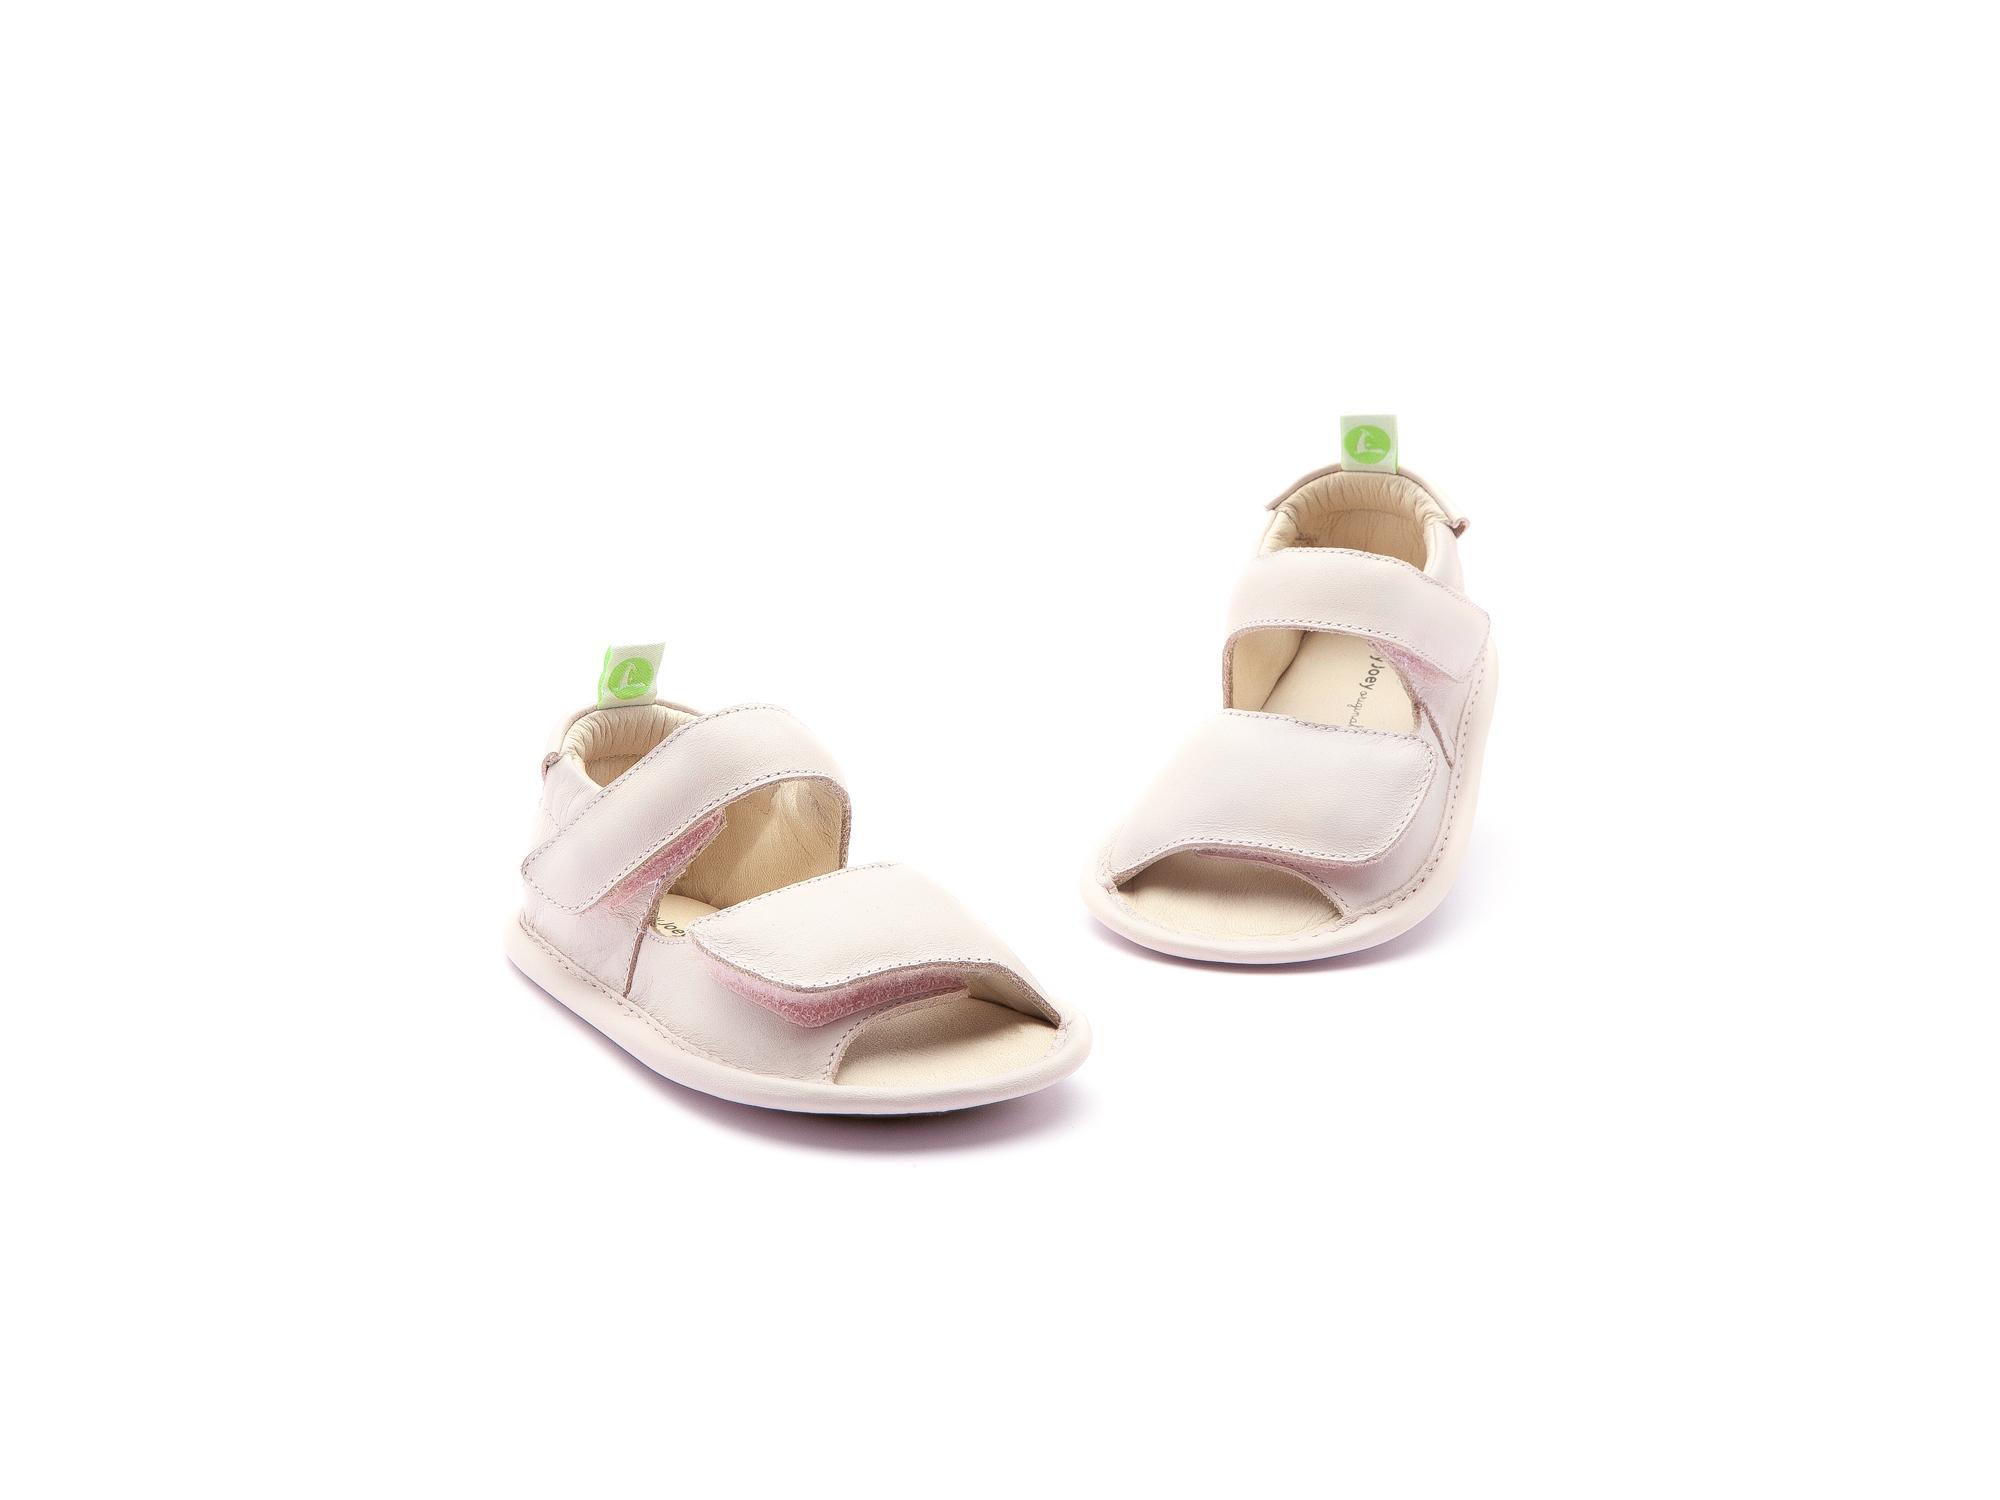 Sandália Toey Cotton Candy Baby 0 à 2 anos - 2